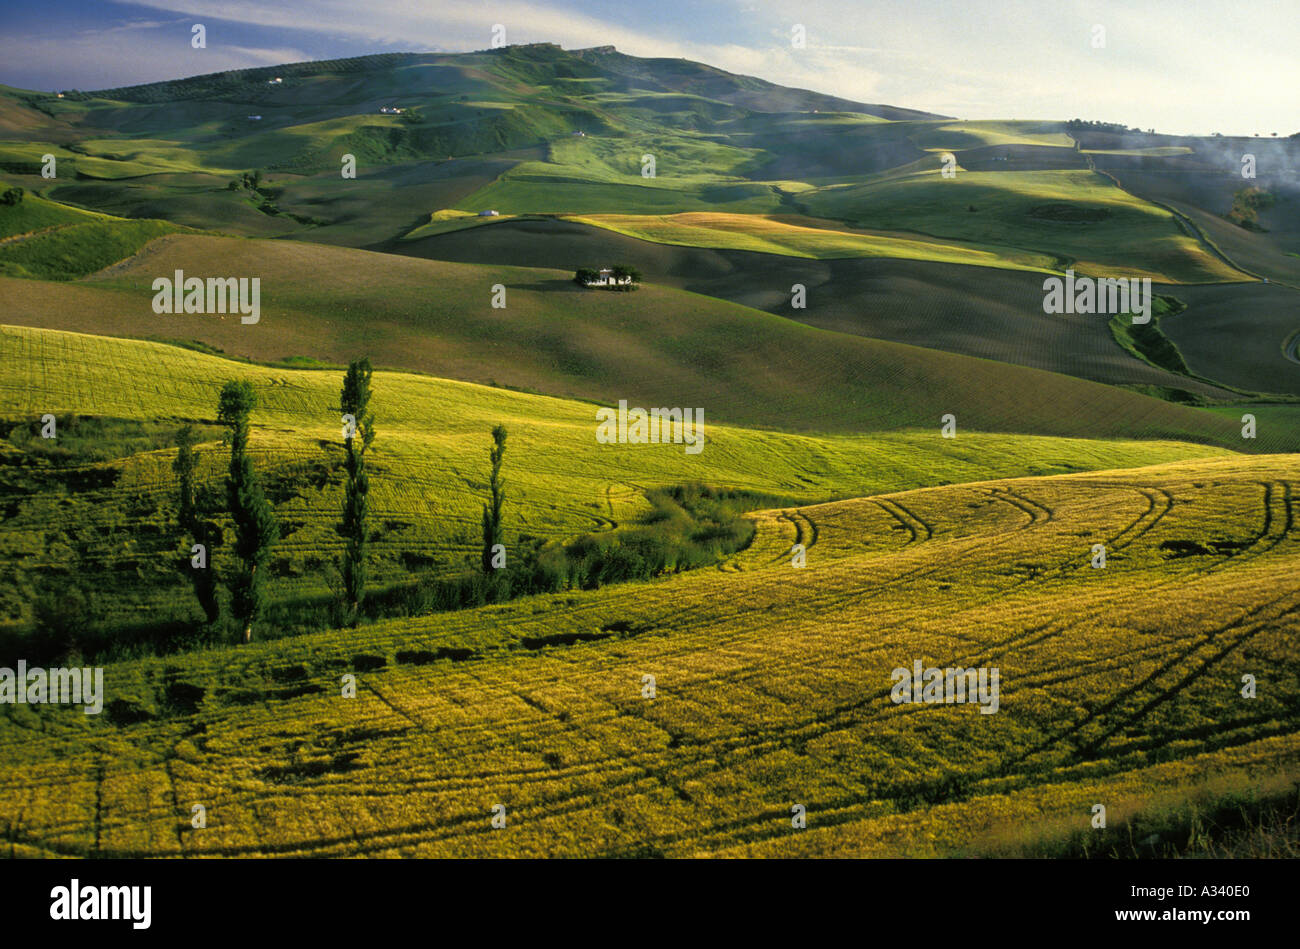 Wheat Fields at Sunset Sierra de Ronda Ronda Málaga Spain - Stock Image